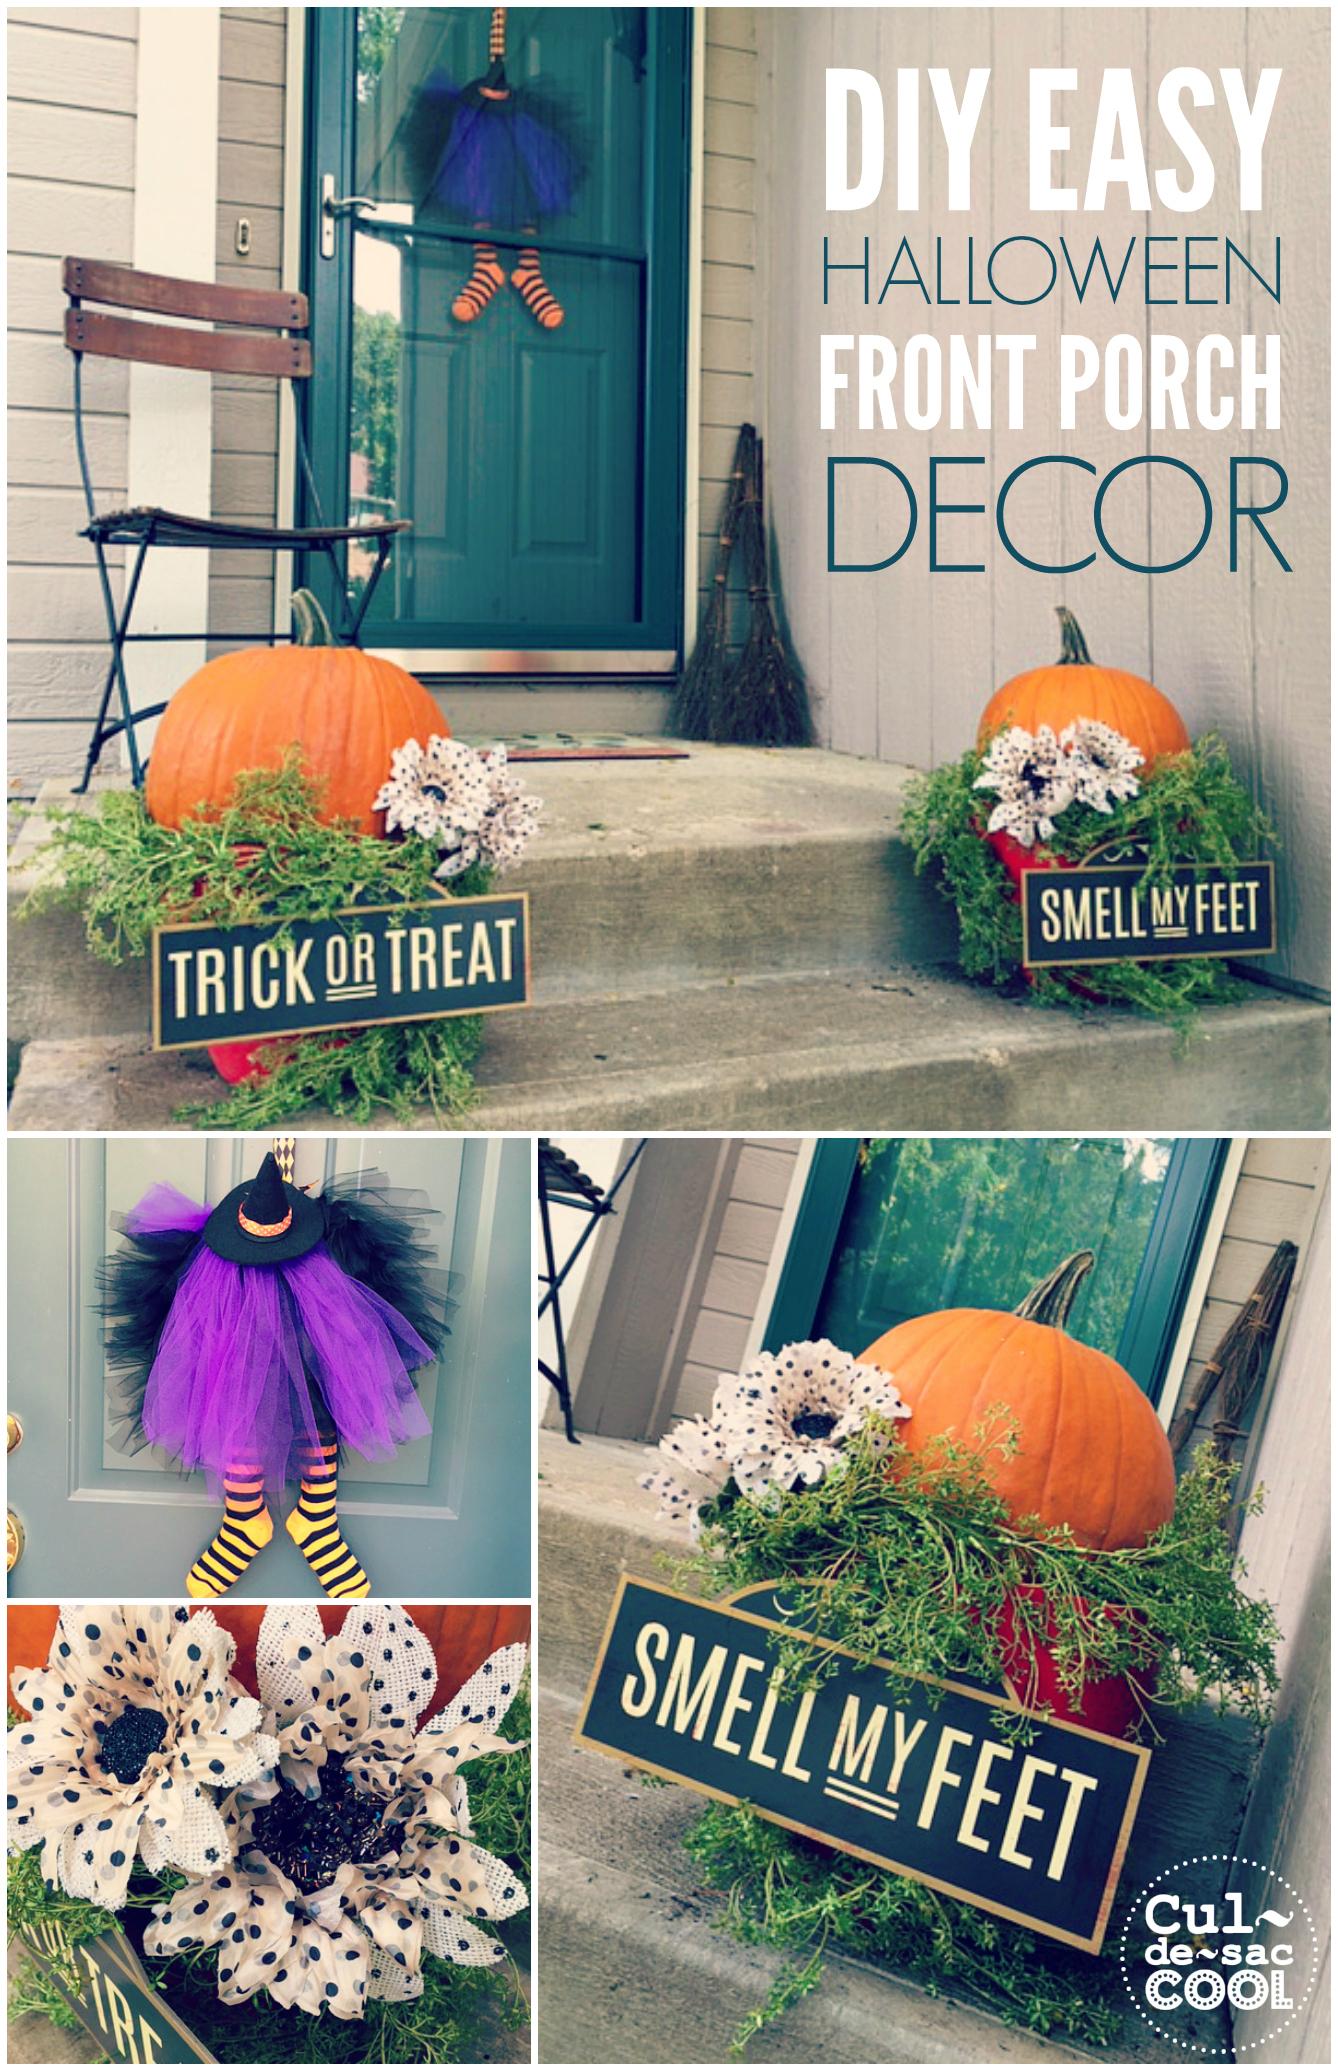 DIY Easy Halloween Front Porch Decor collage 3